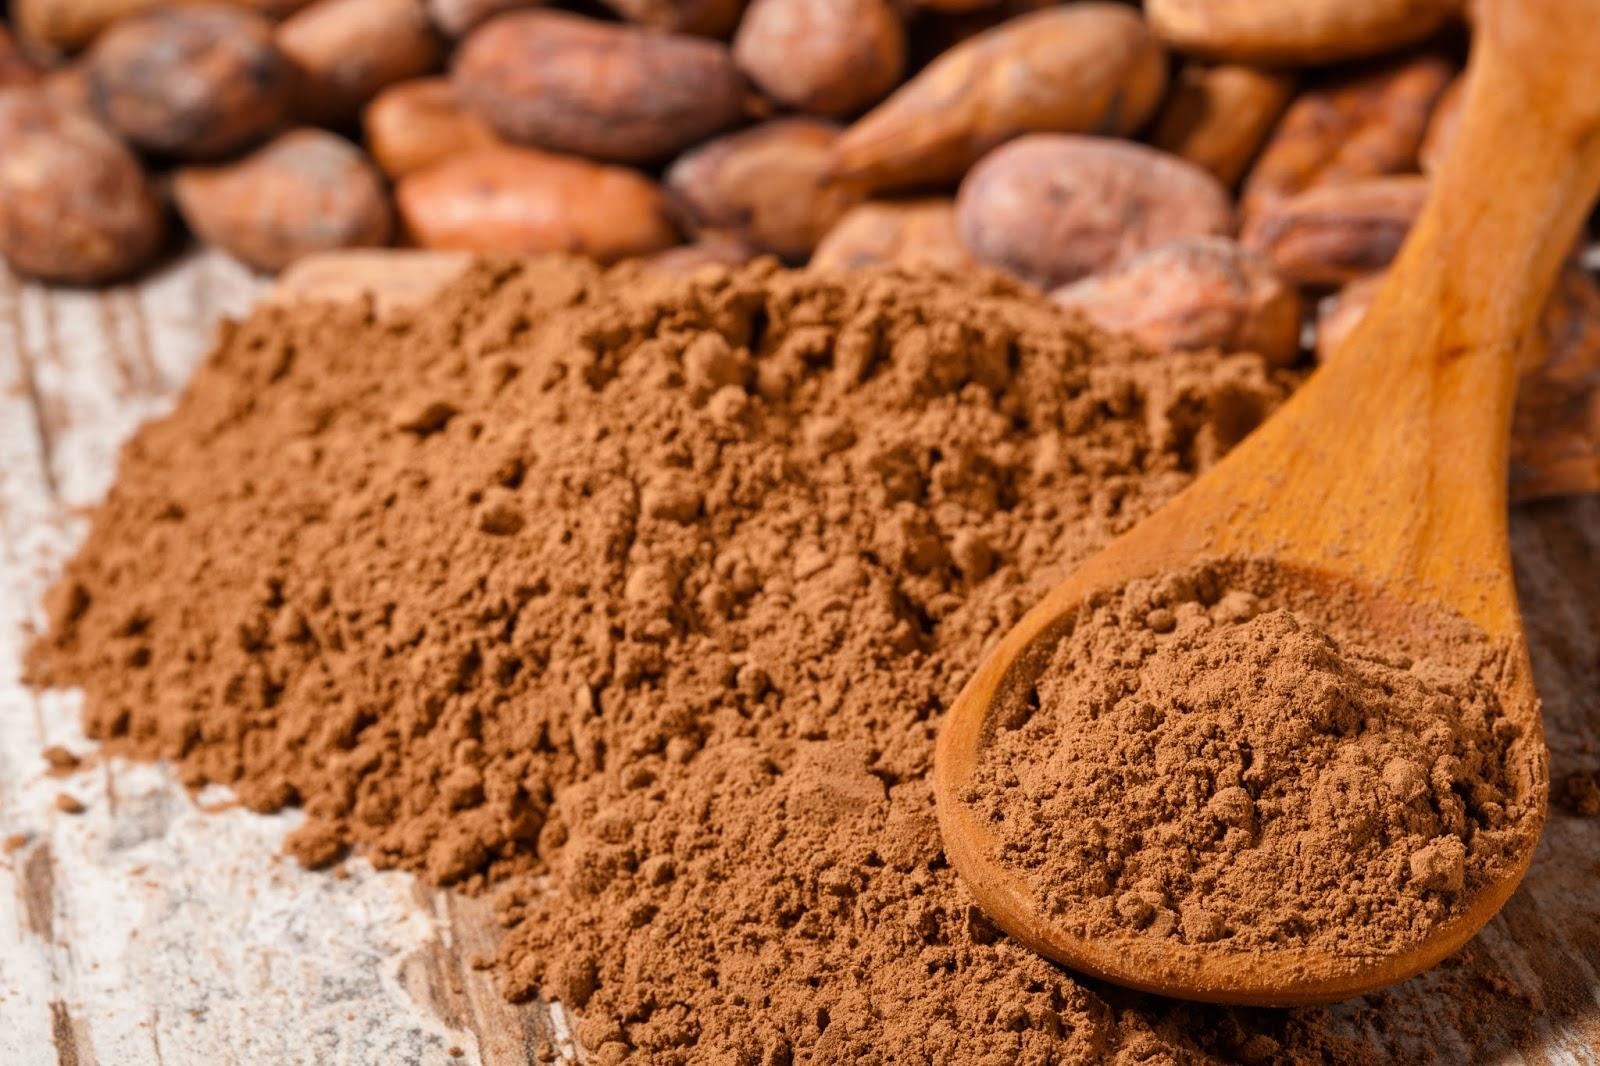 is-cacao-powder-paleo.jpg